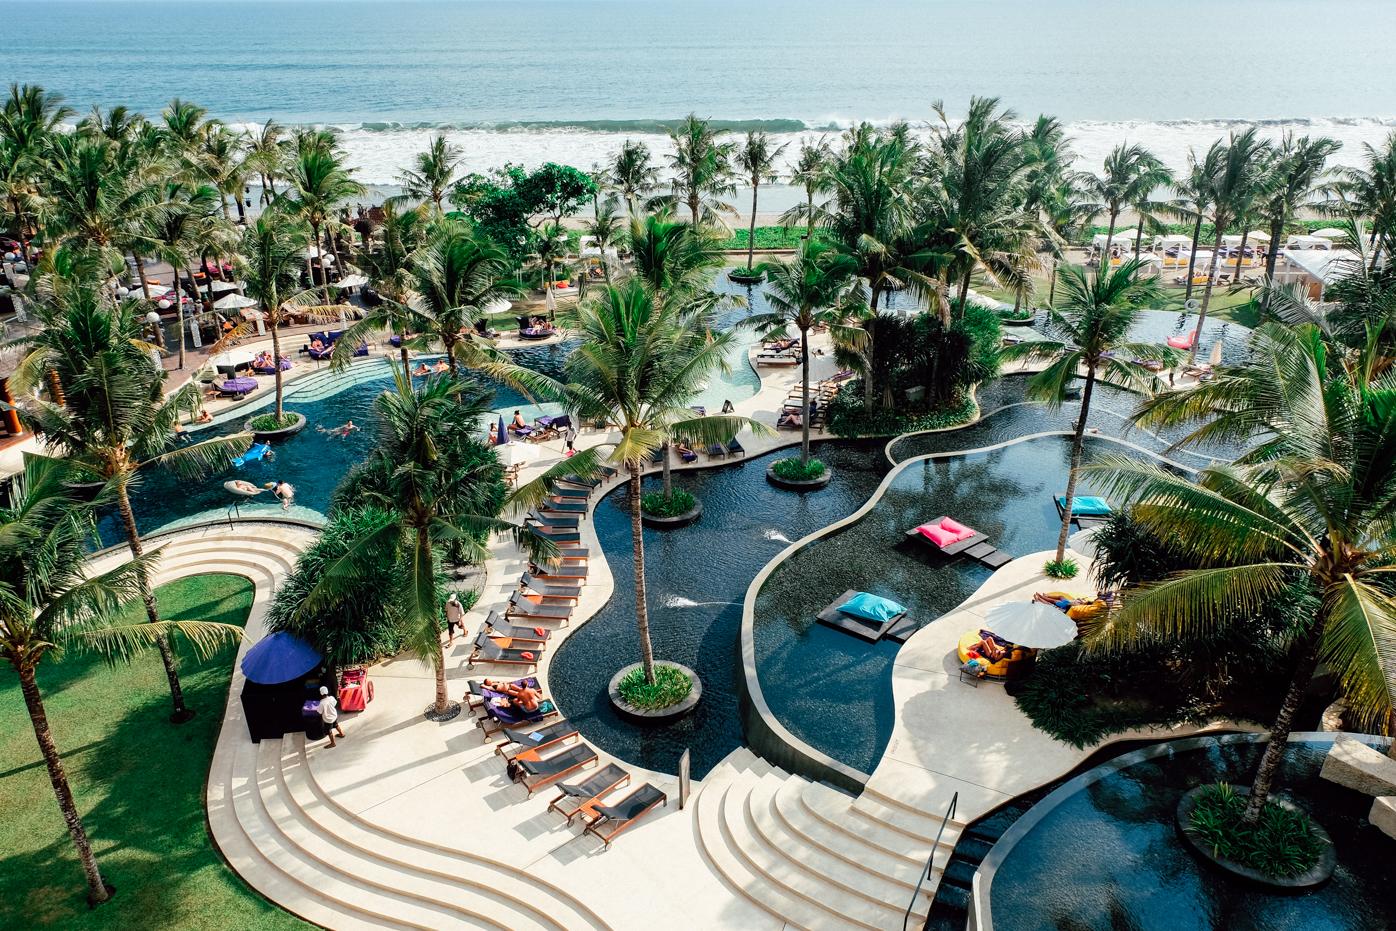 wbali, seminyak, bali, ihotel, blogger, reddress, luxury, hiphotel, vacation, indonesia, outlanderly